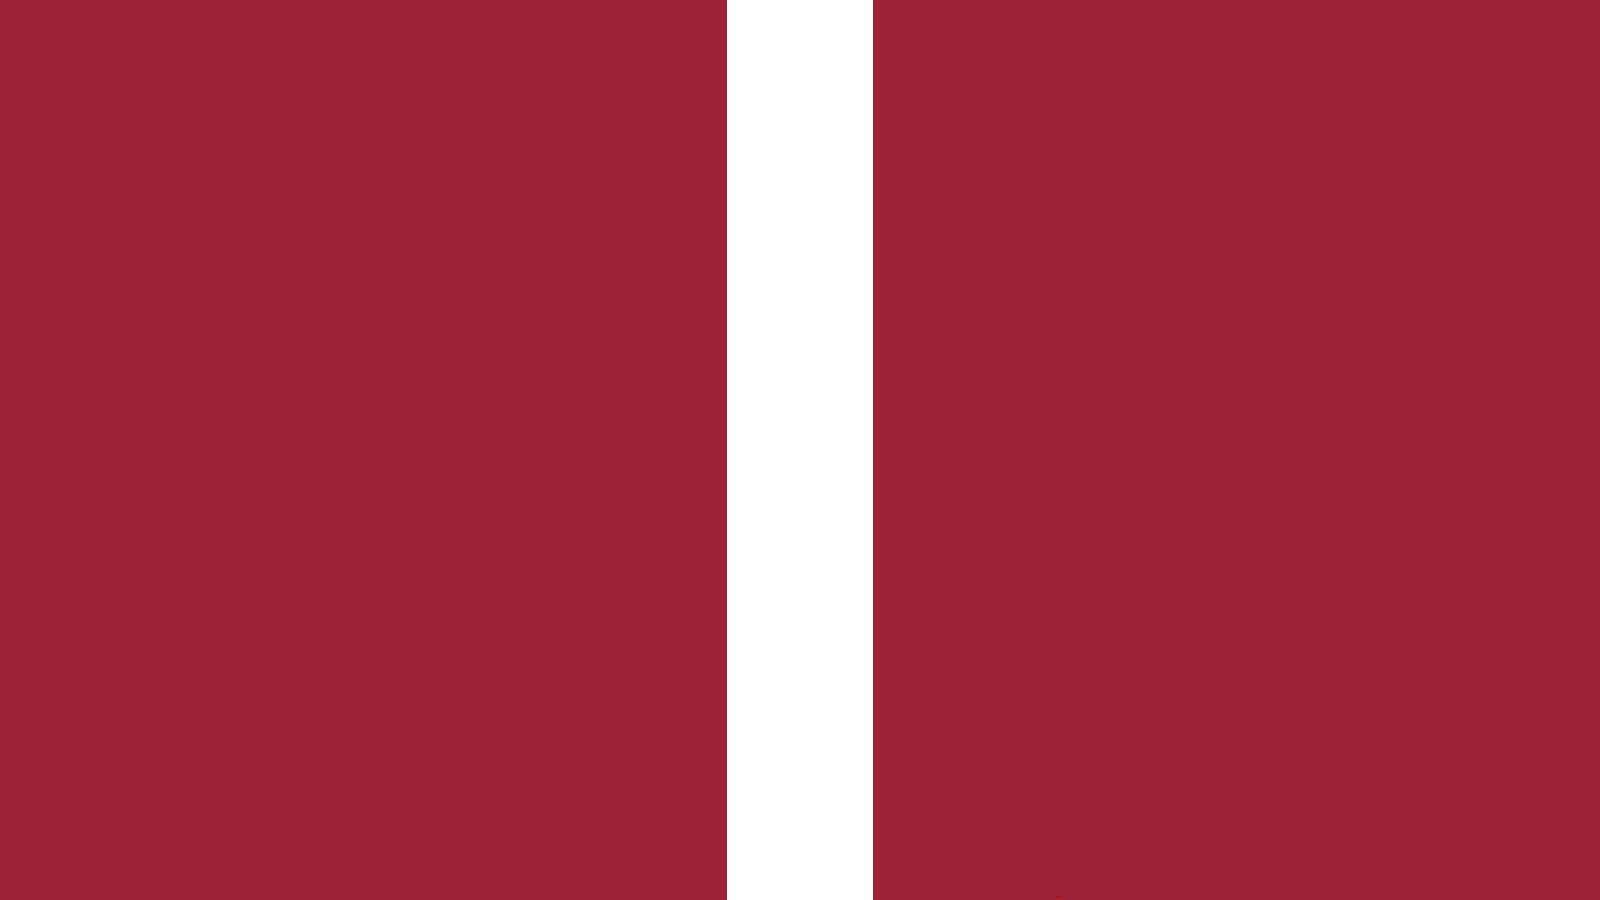 Tennessee Vols at Arkansas Razorbacks (Reduced Capacity, Social Distancing)